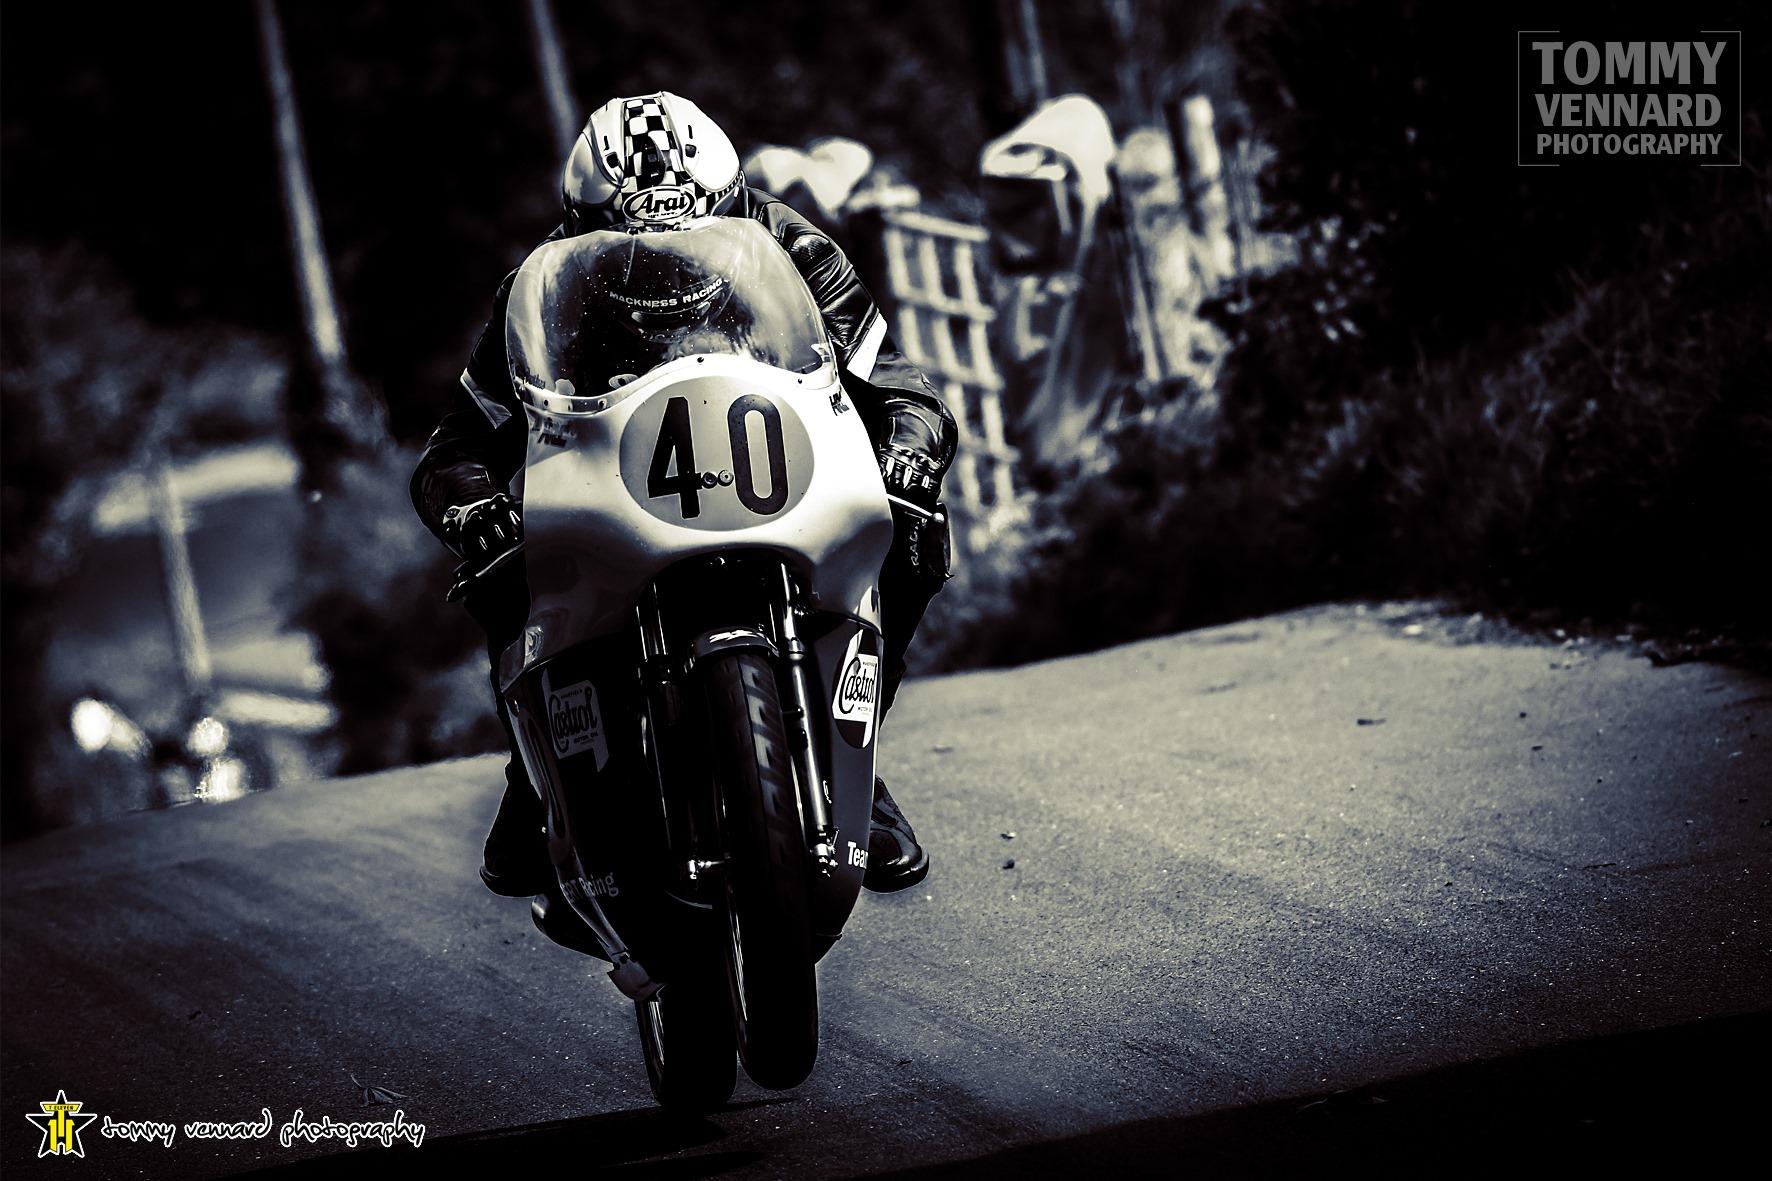 Manx GP Top 6: Barry Davidson